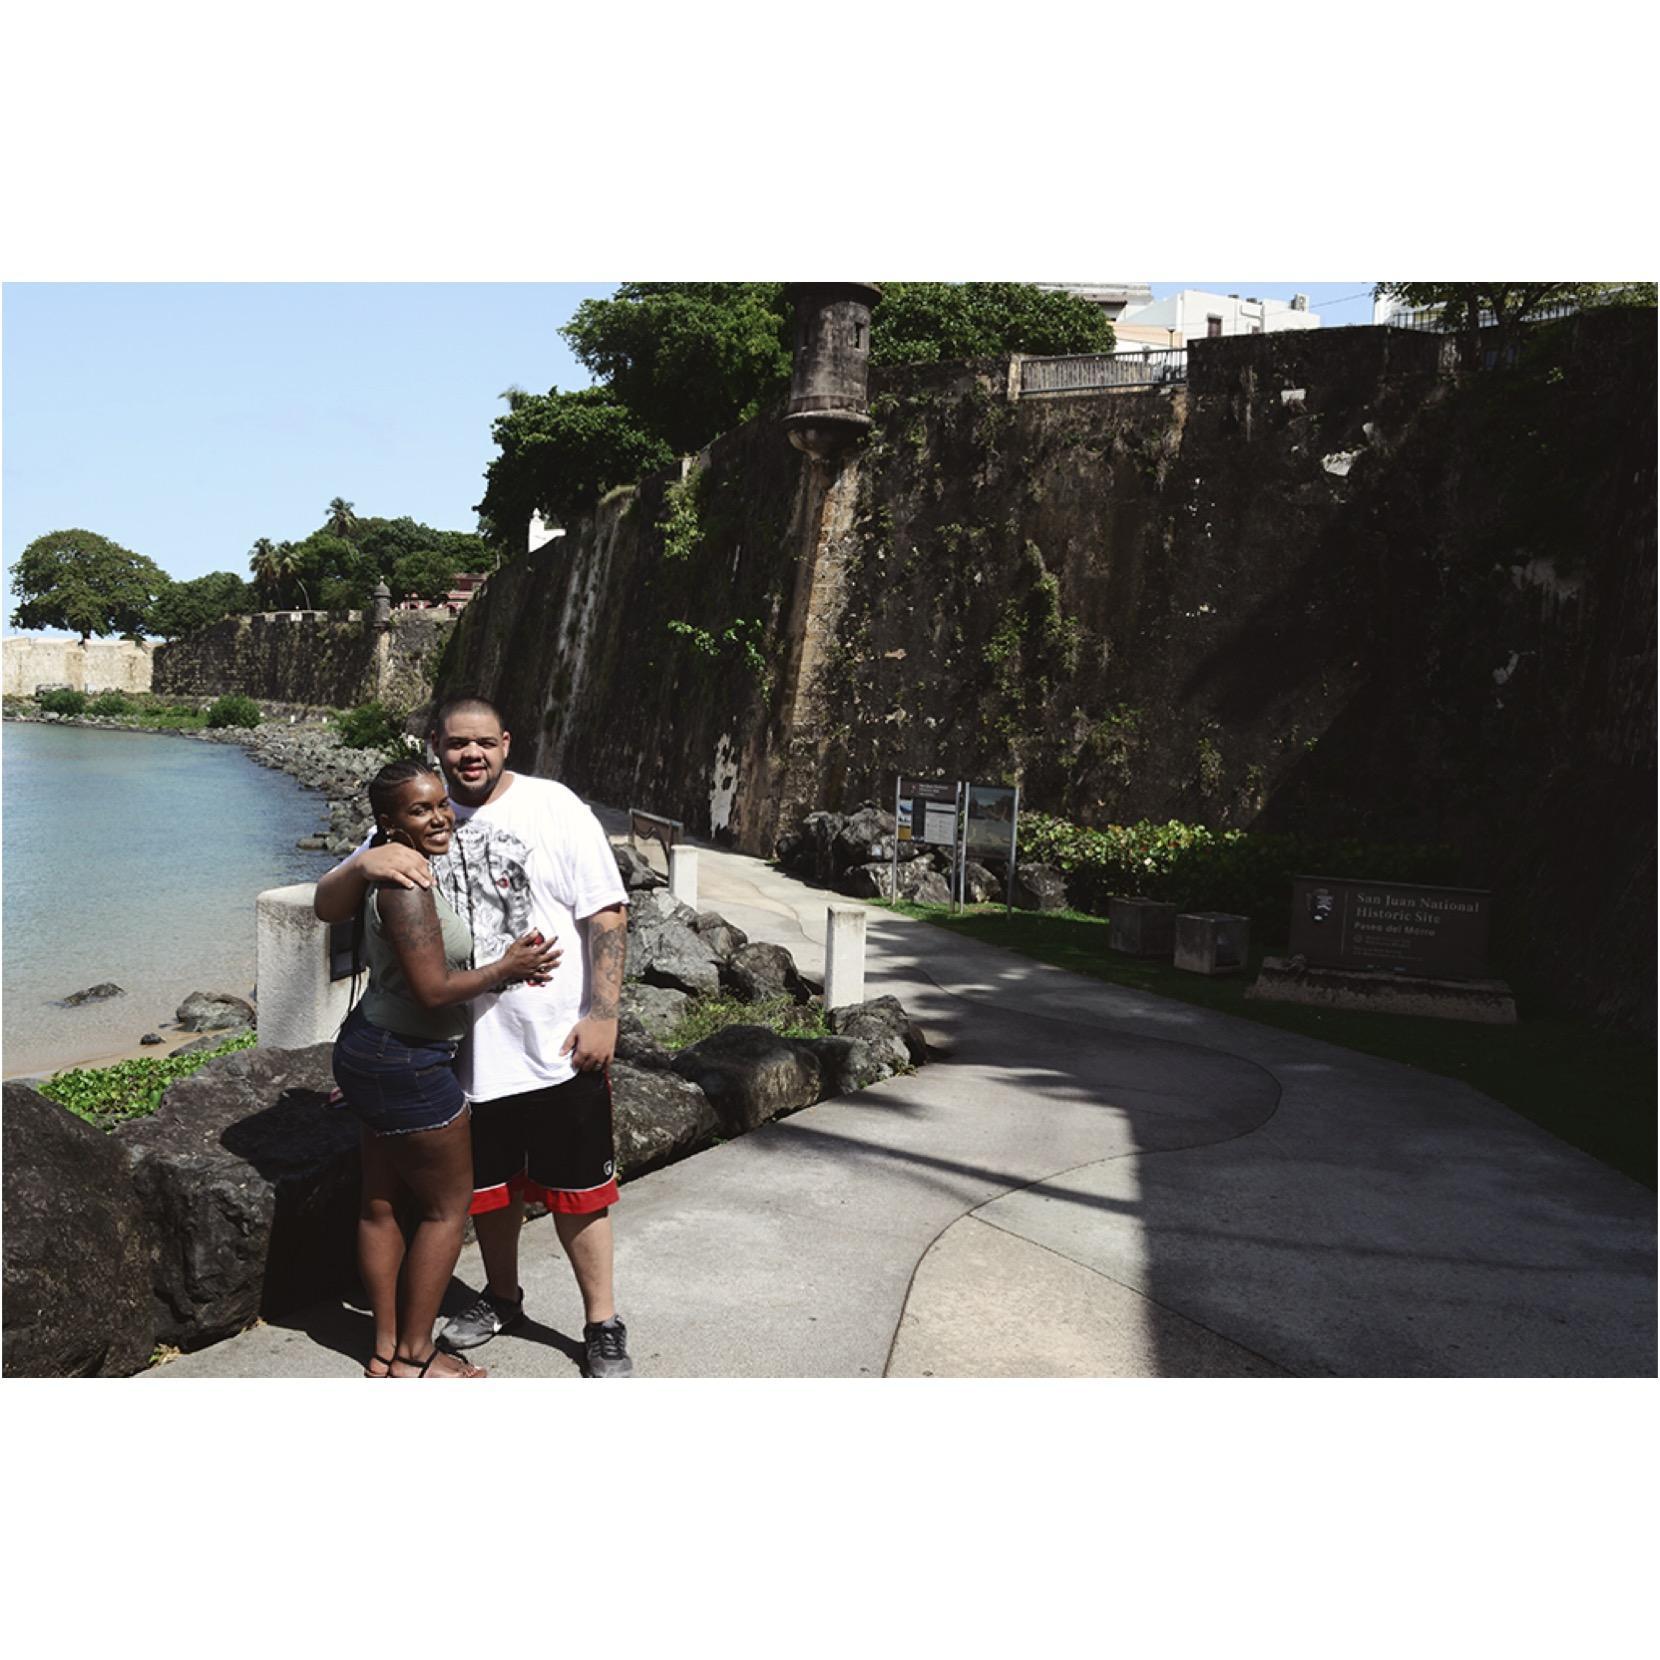 Celebrating our 5th wedding anniversary in San Juan